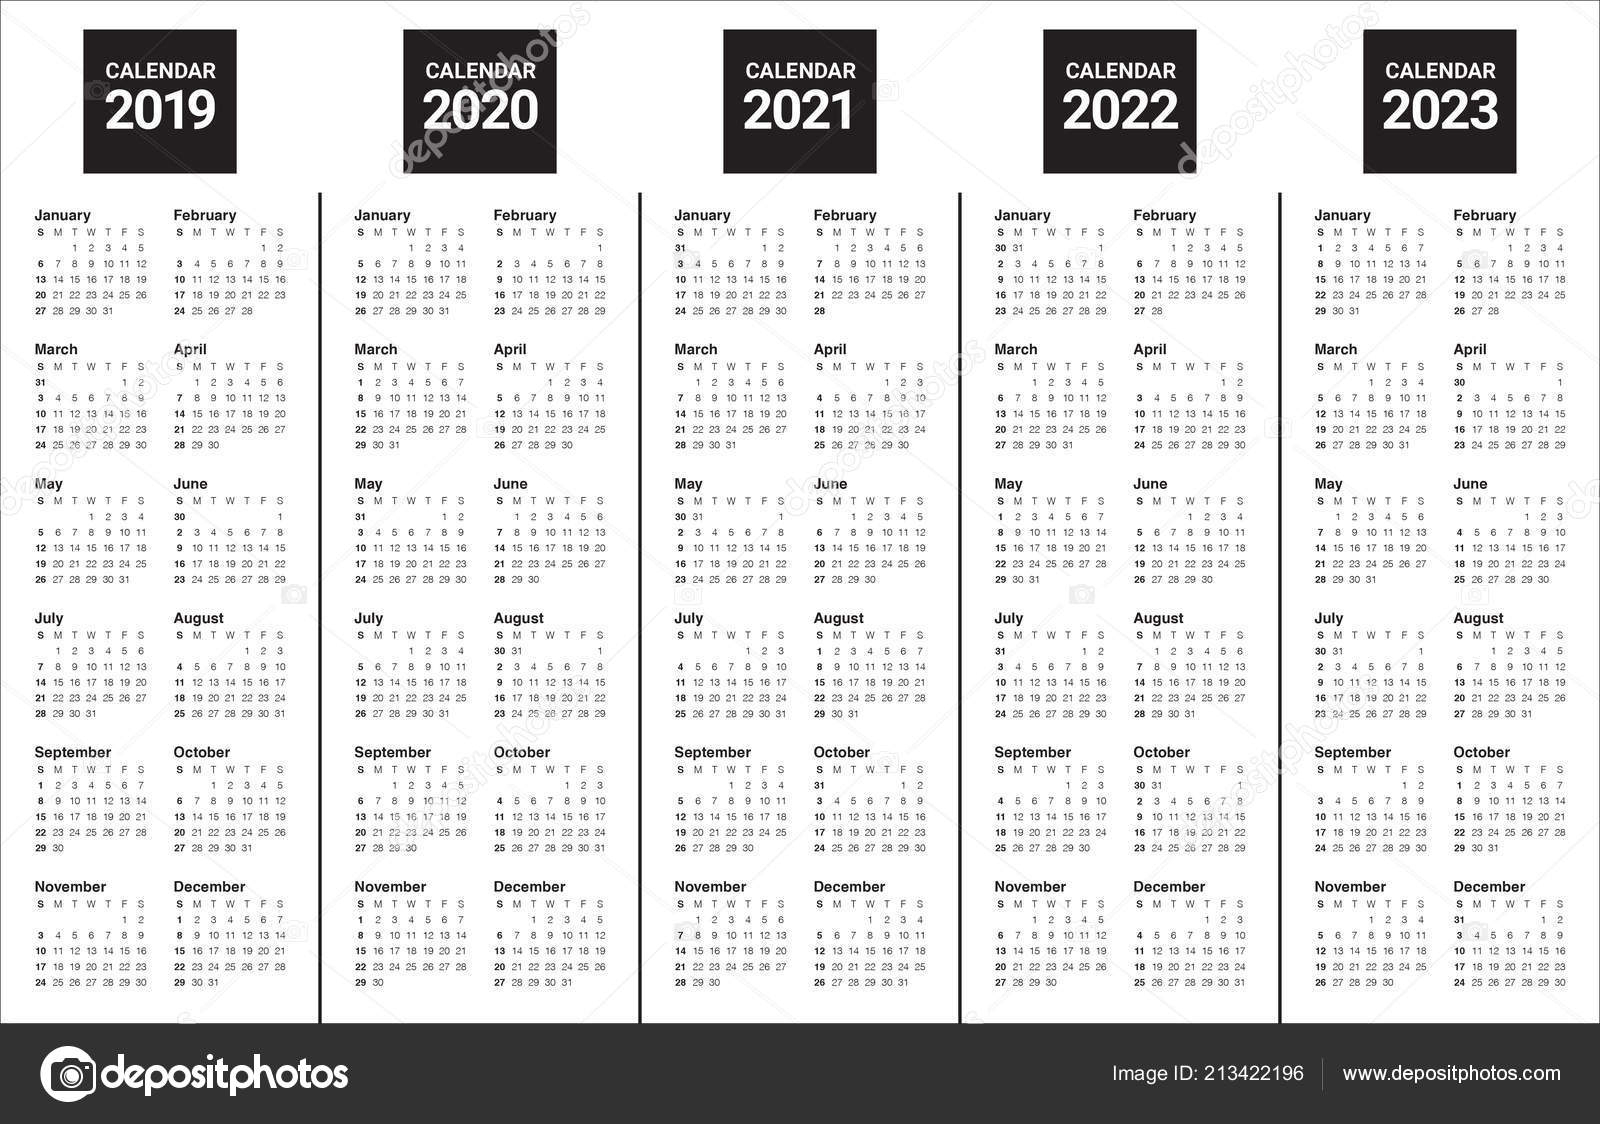 Year 2019 2020 2021 2022 2023 Calendar Vector Design Template pertaining to Print 2019 2020 2021 2022 2023 Calender